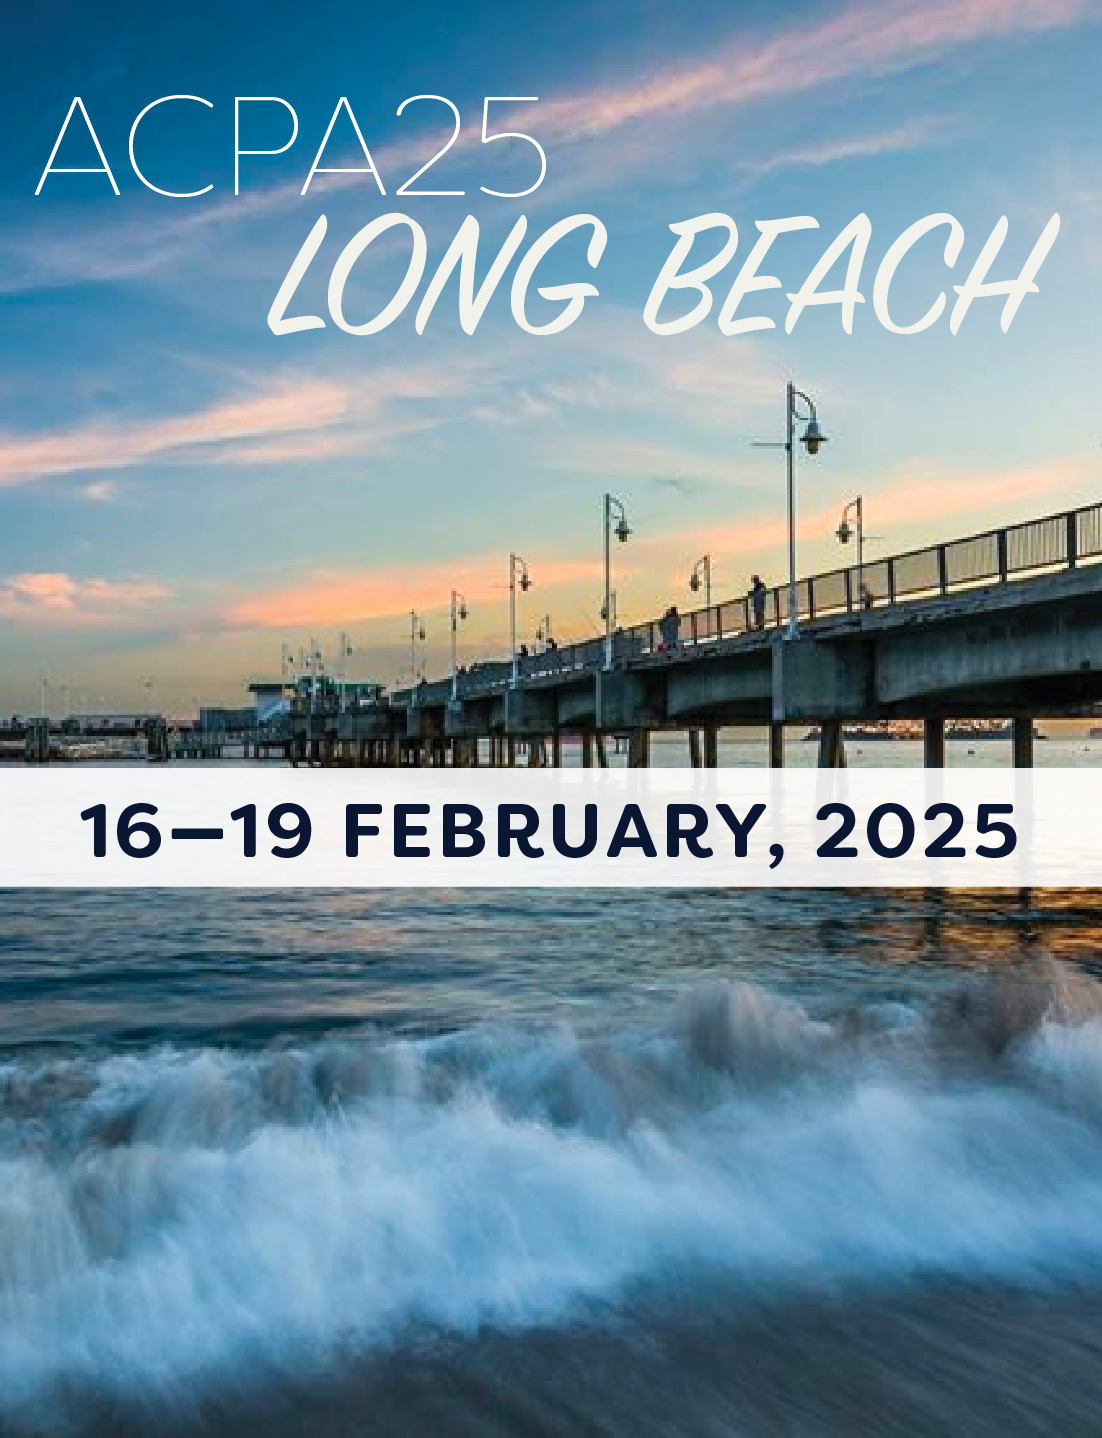 ACPA25 Long Beach 16-19 February 2021